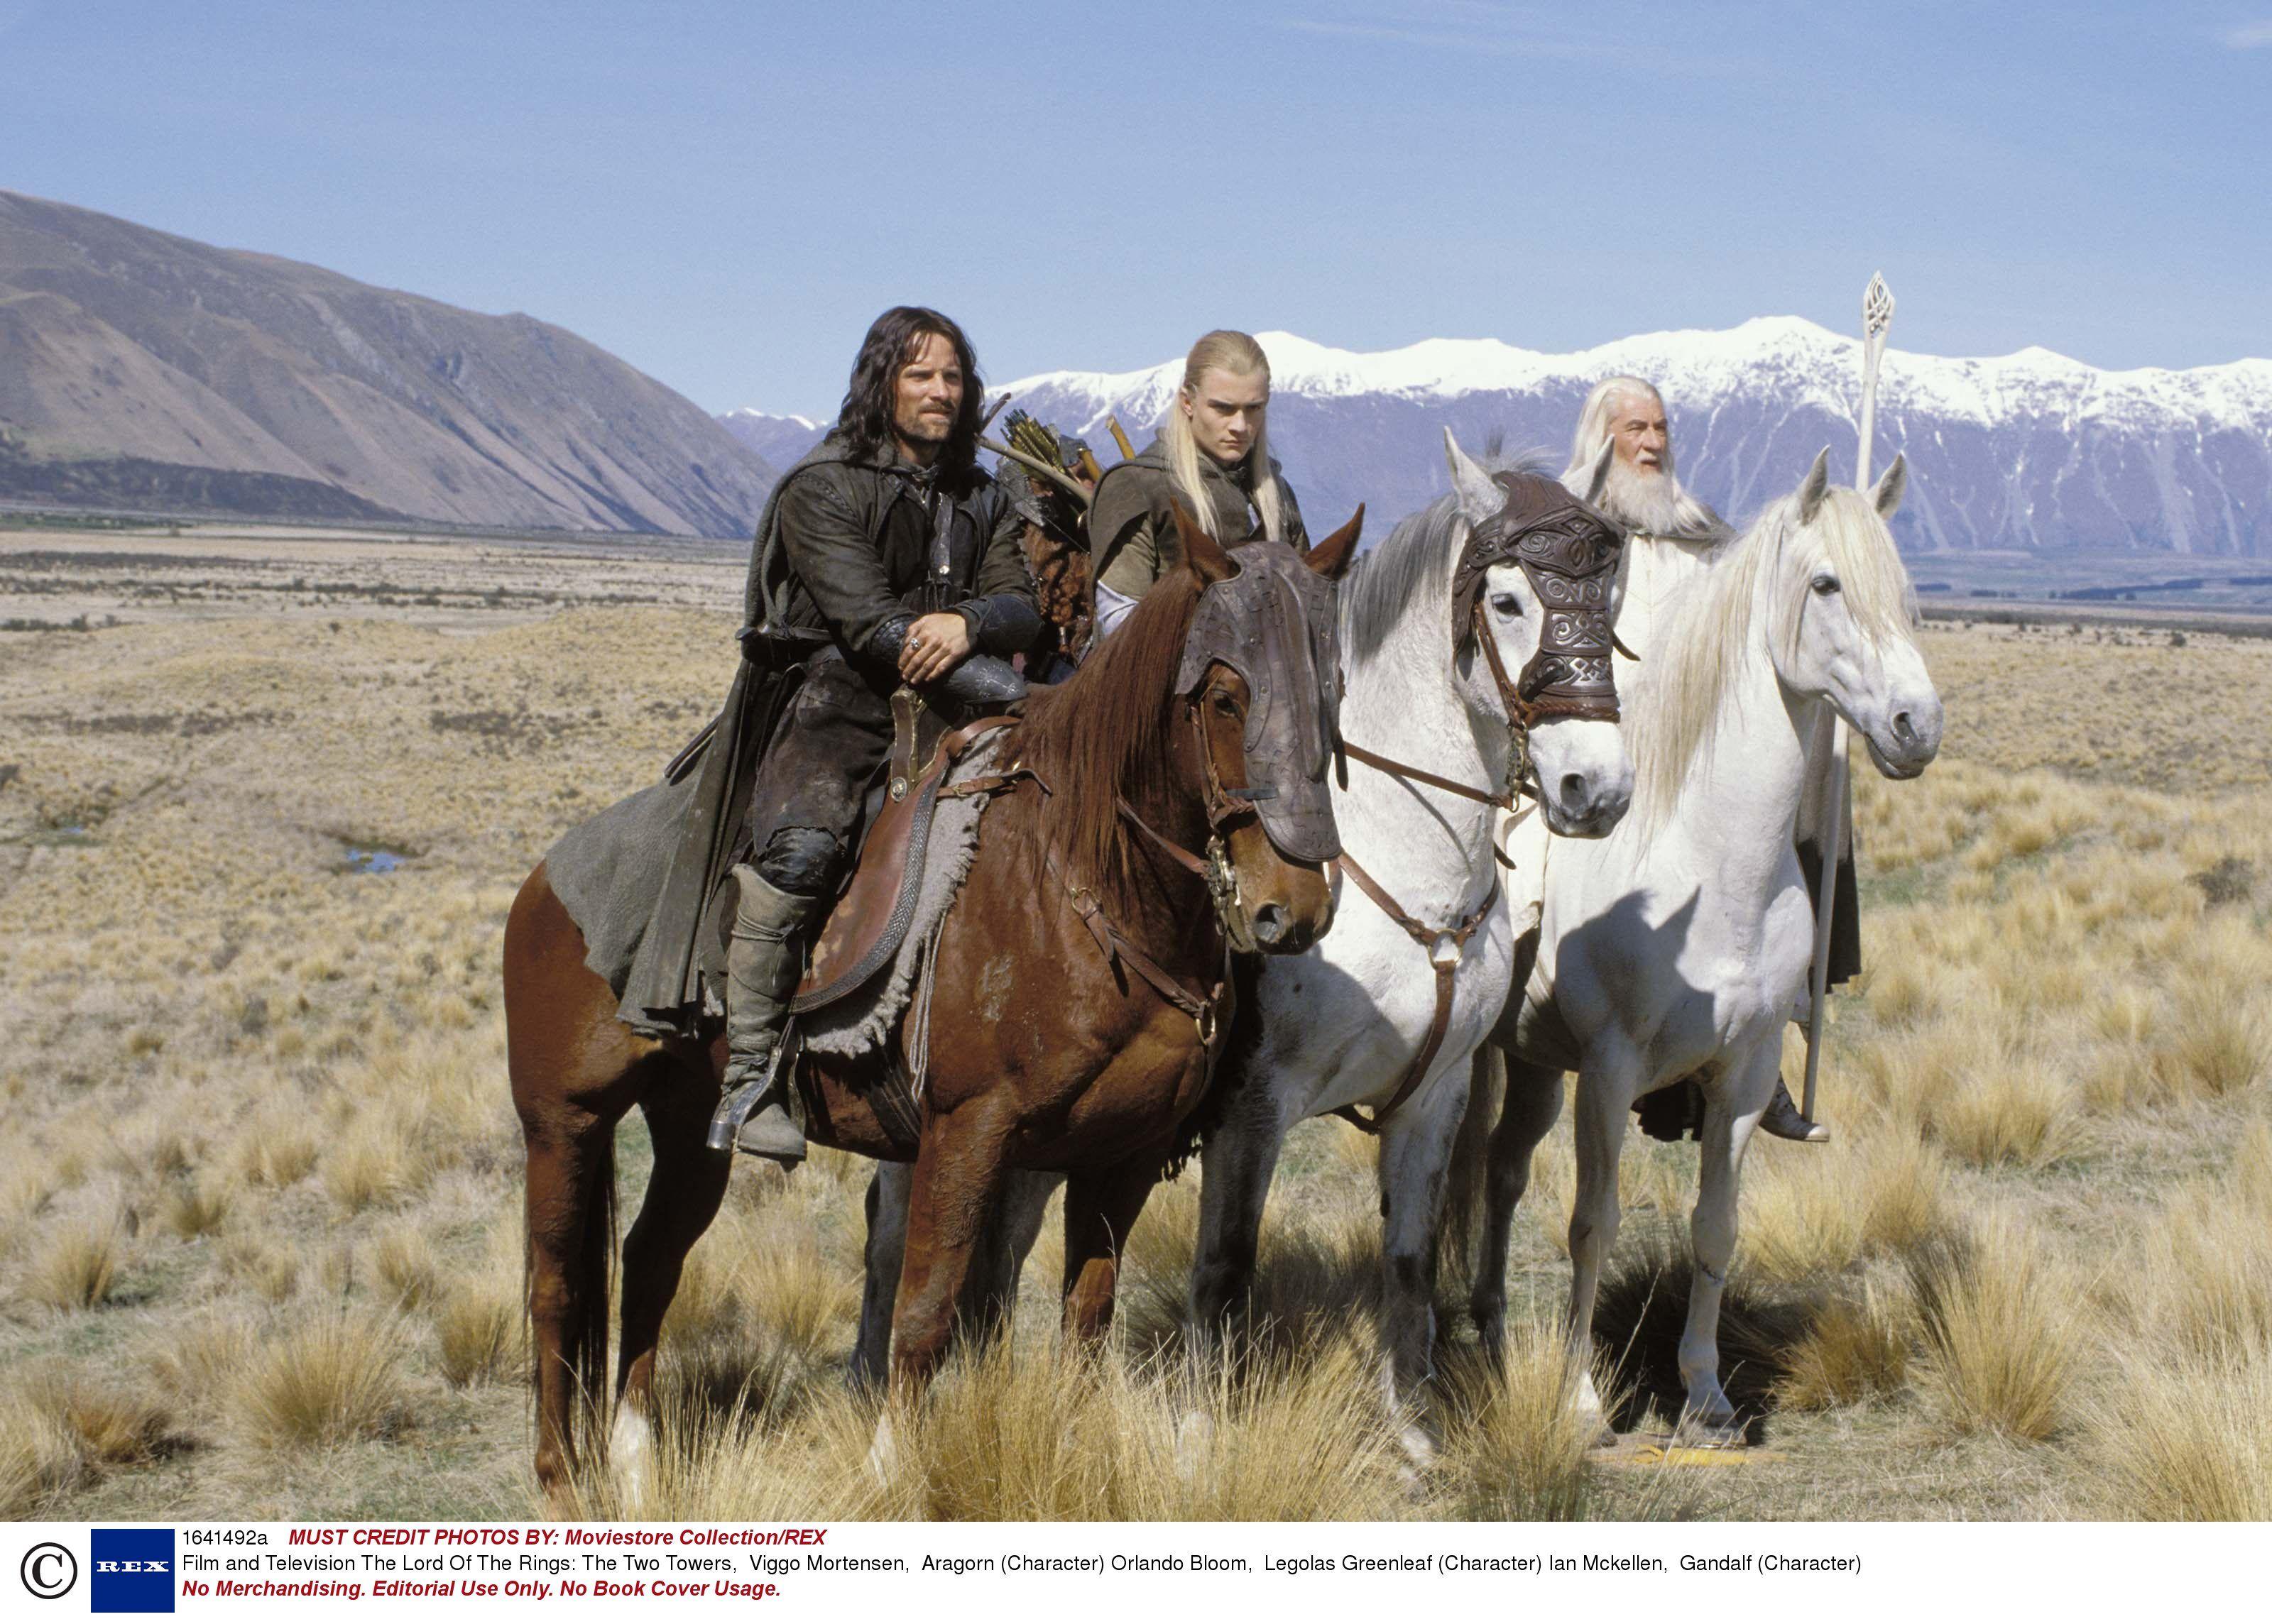 Artax, Joey: 11 Greatest screen horses